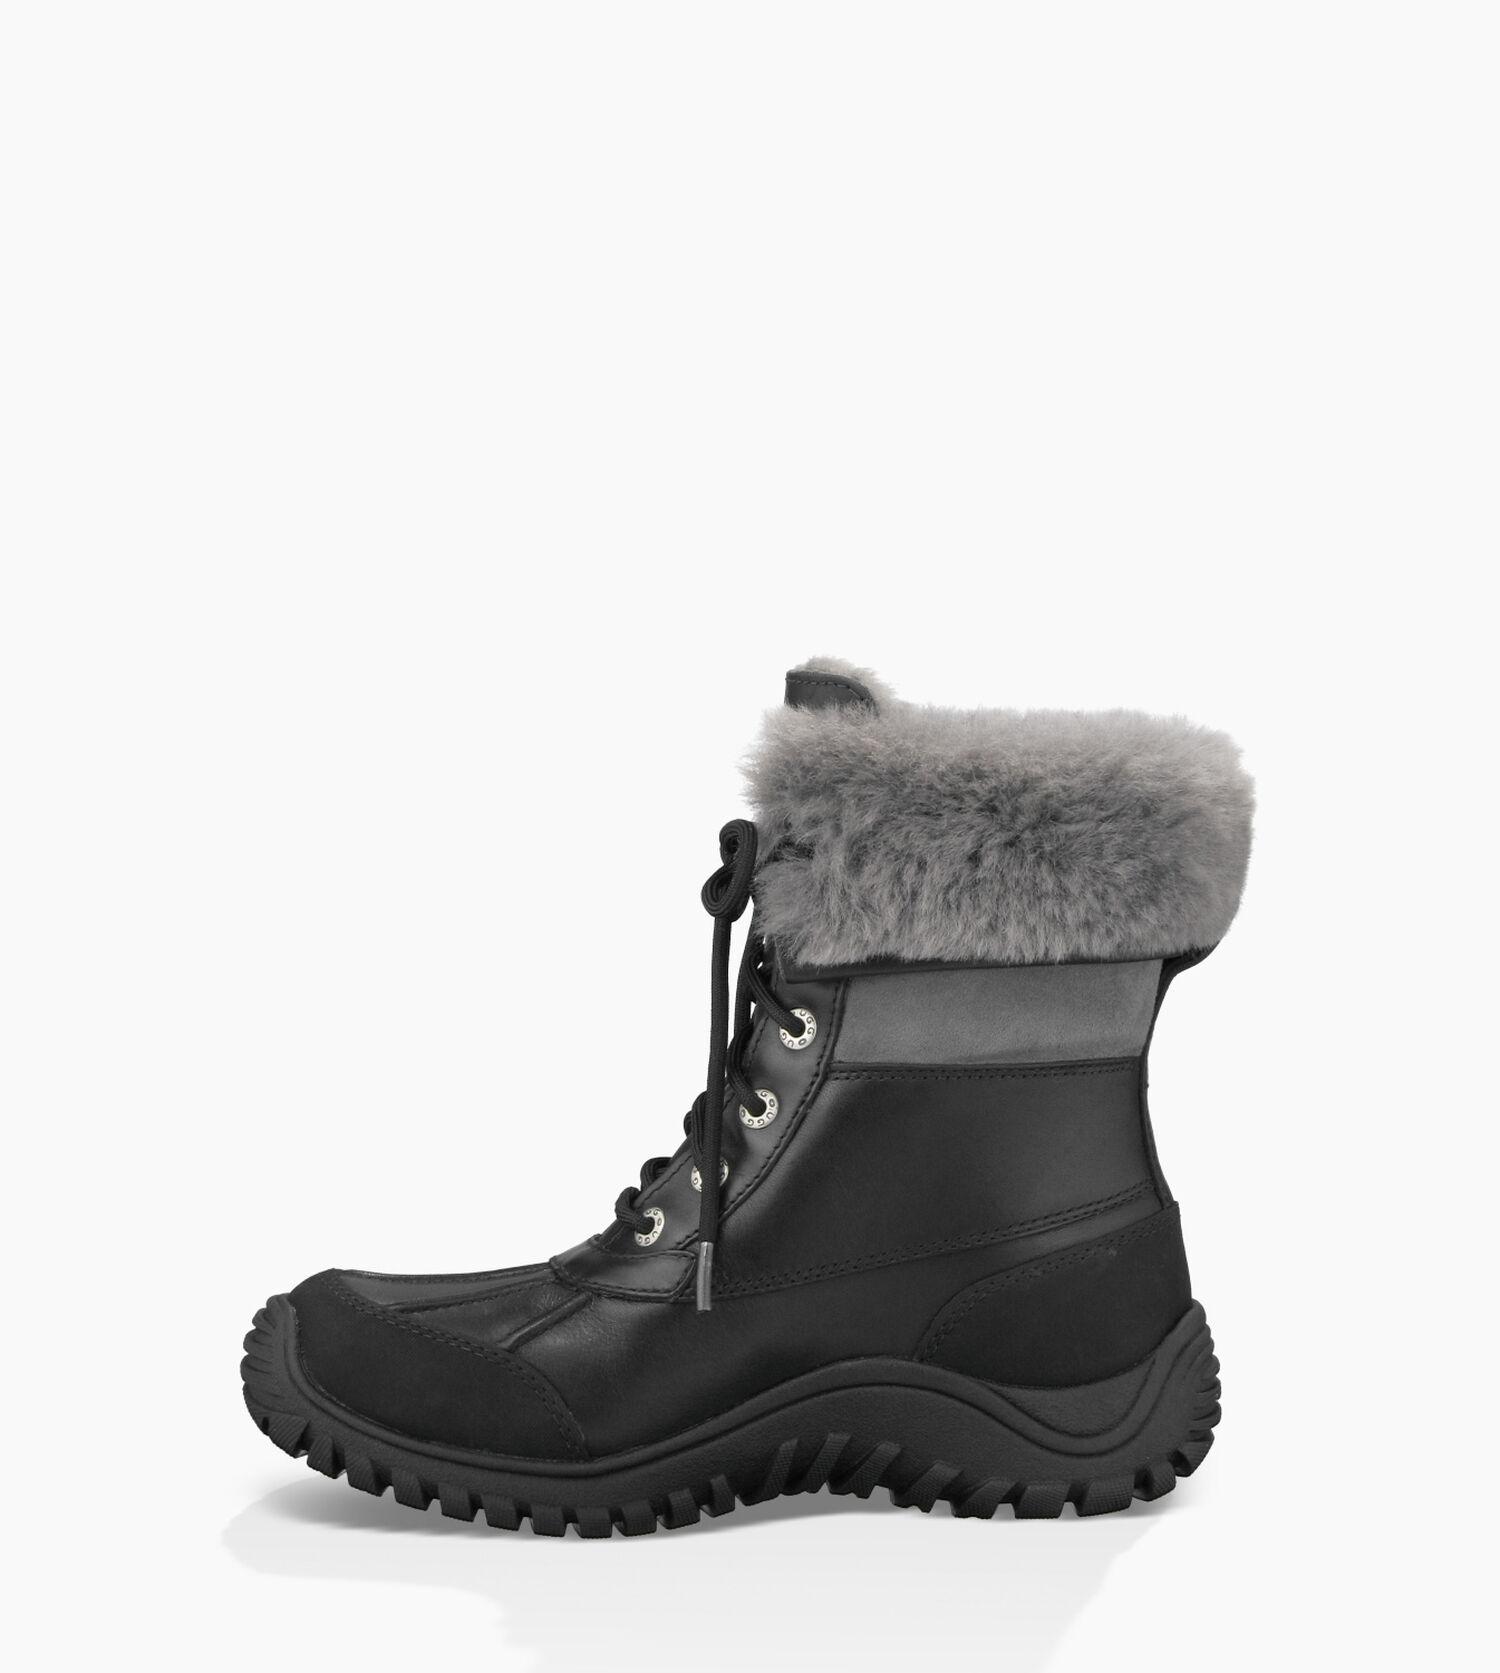 9c2e5b0b040 Women's Share this product Adirondack Boot II - Leather